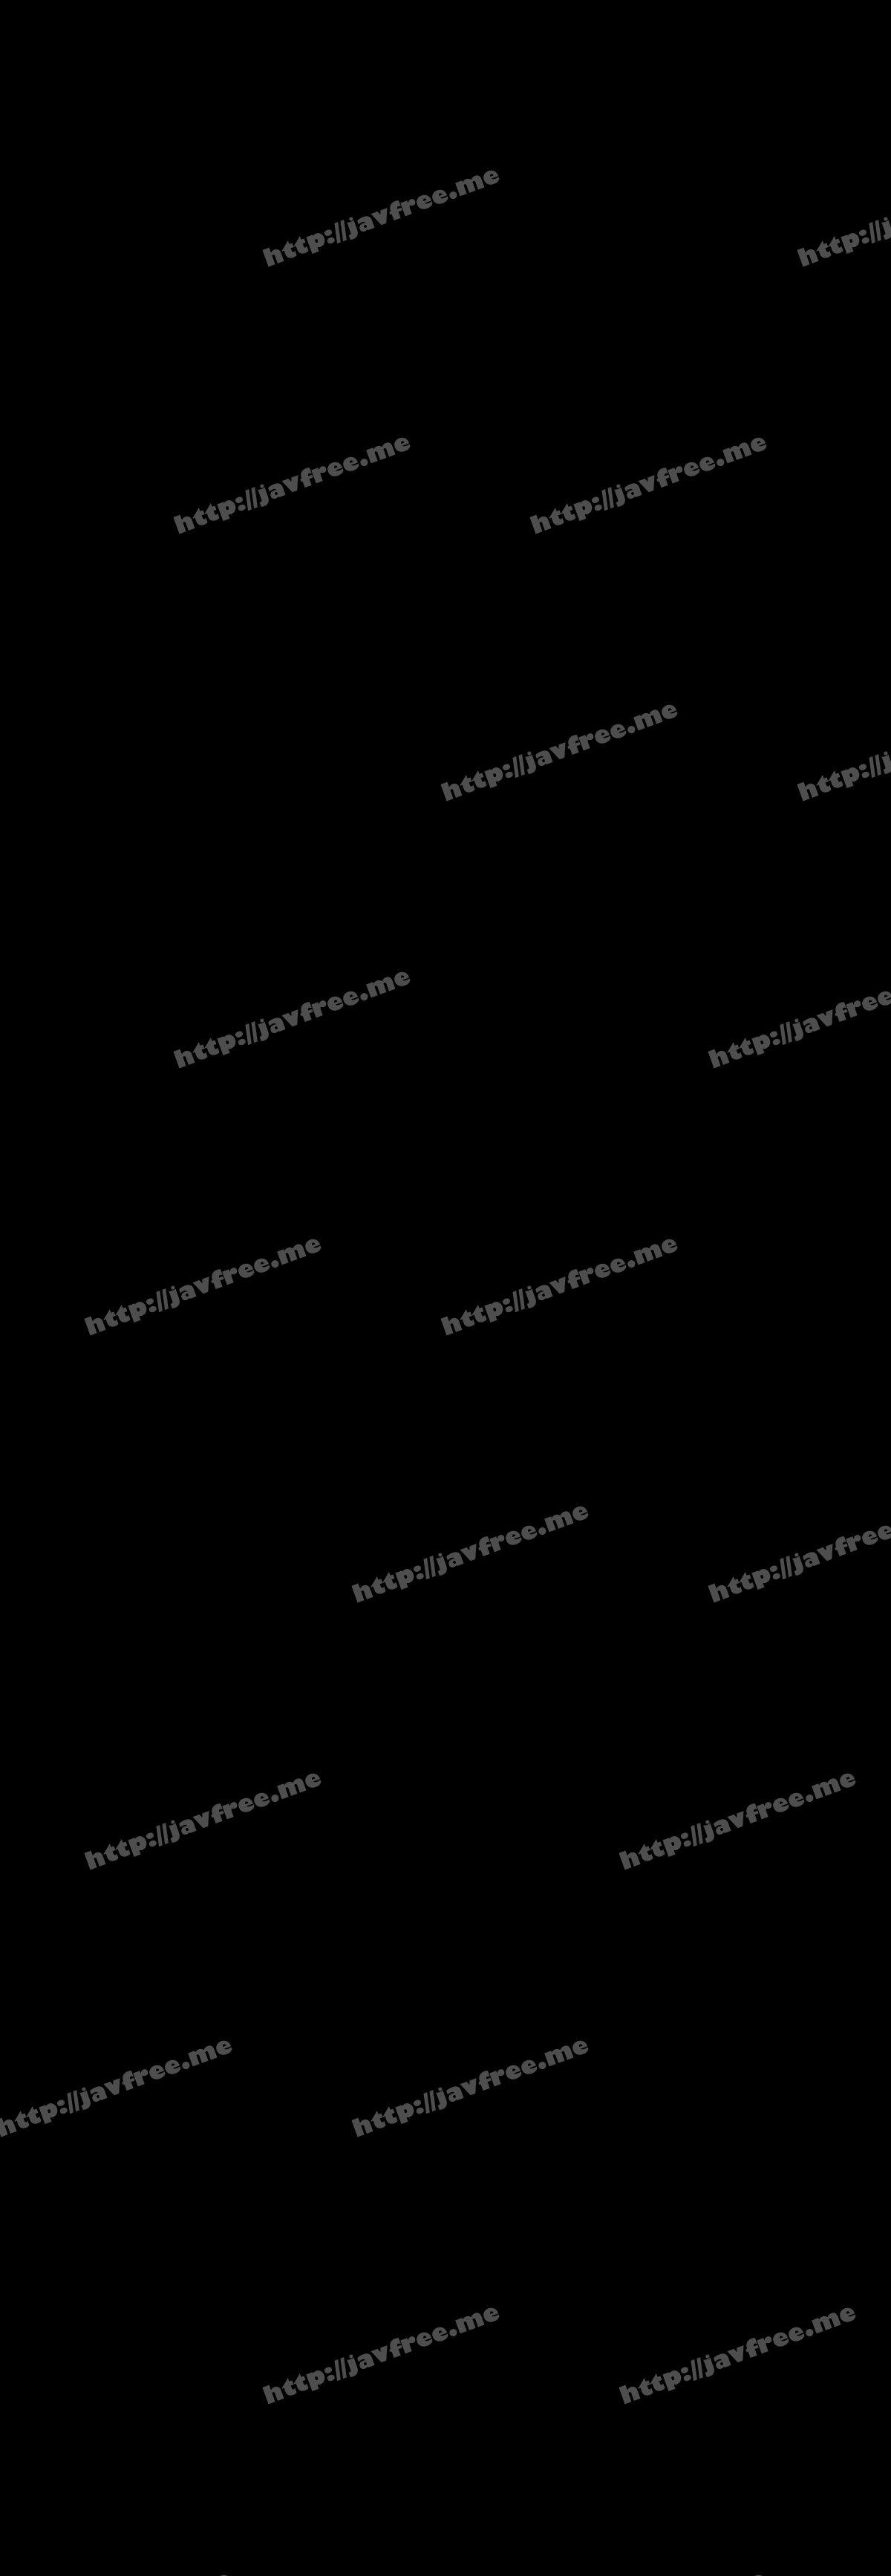 [HD][SABA-546] 【急募】「エロい友達紹介してください!」ノーブラ待ち合わせ即SEX Vol.001